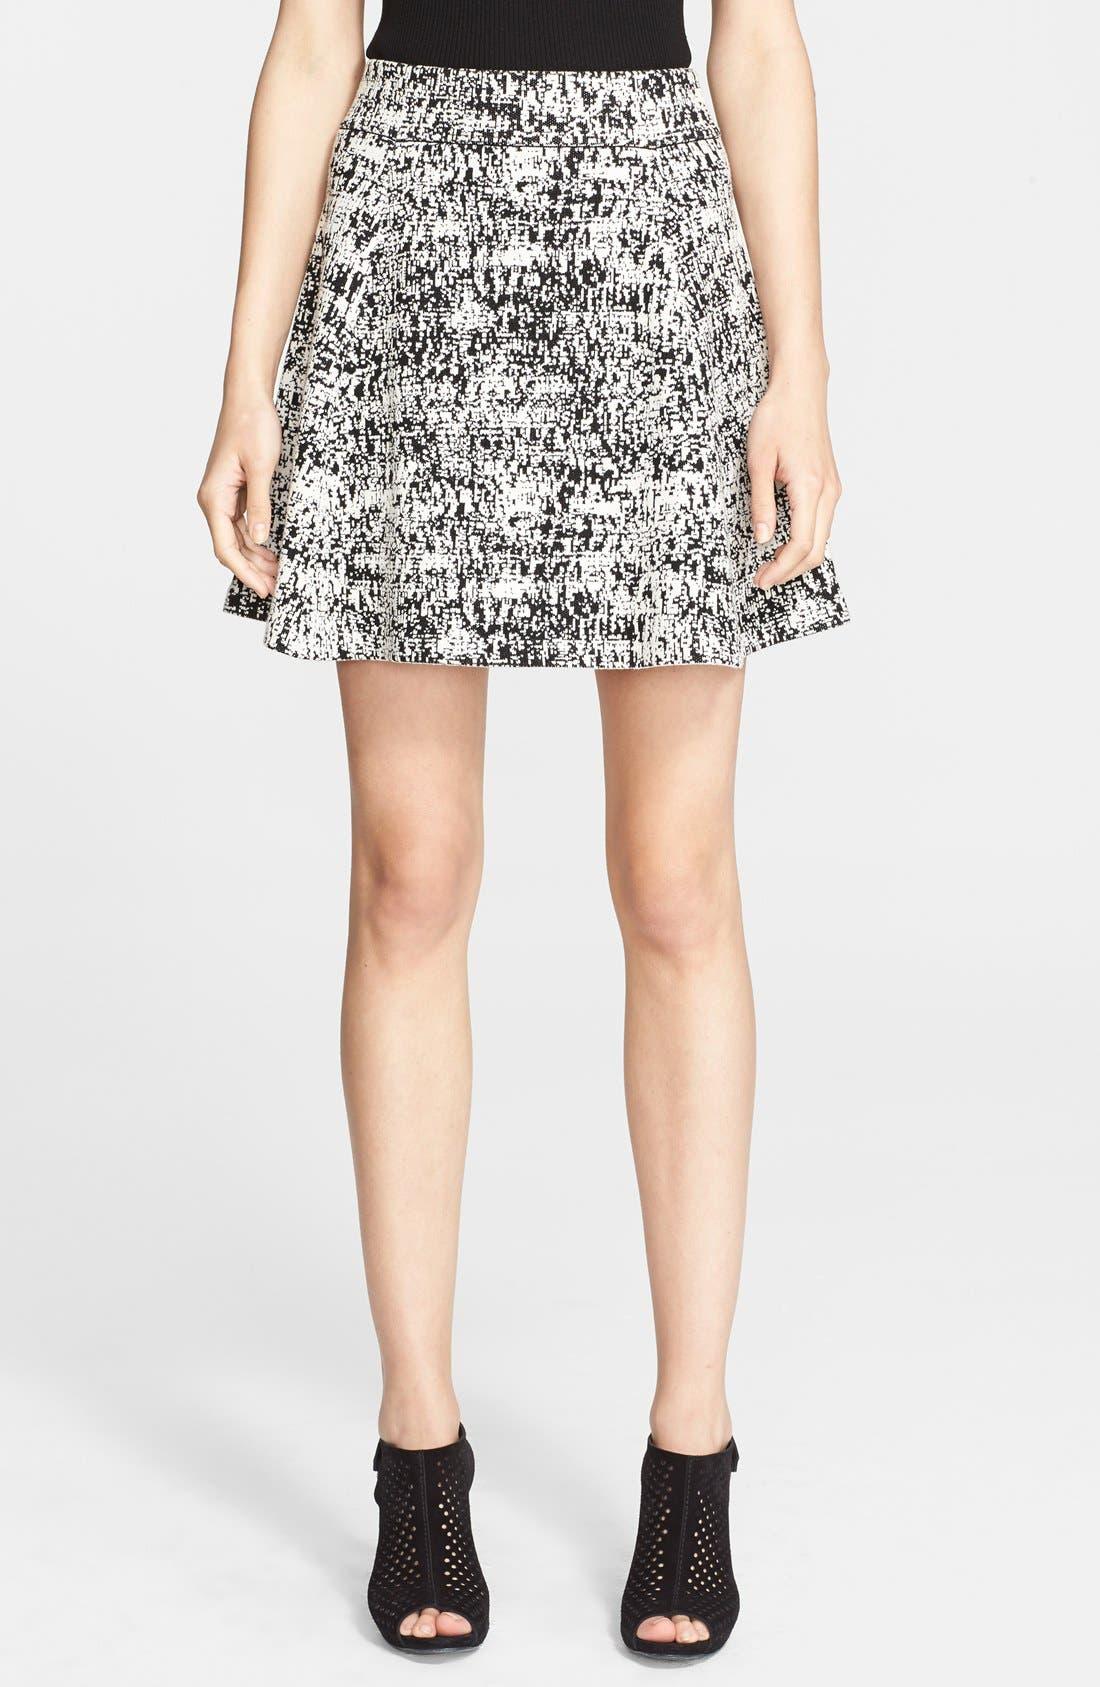 Alternate Image 1 Selected - Theory 'Doreene Tweedscape' Print Woven Skirt